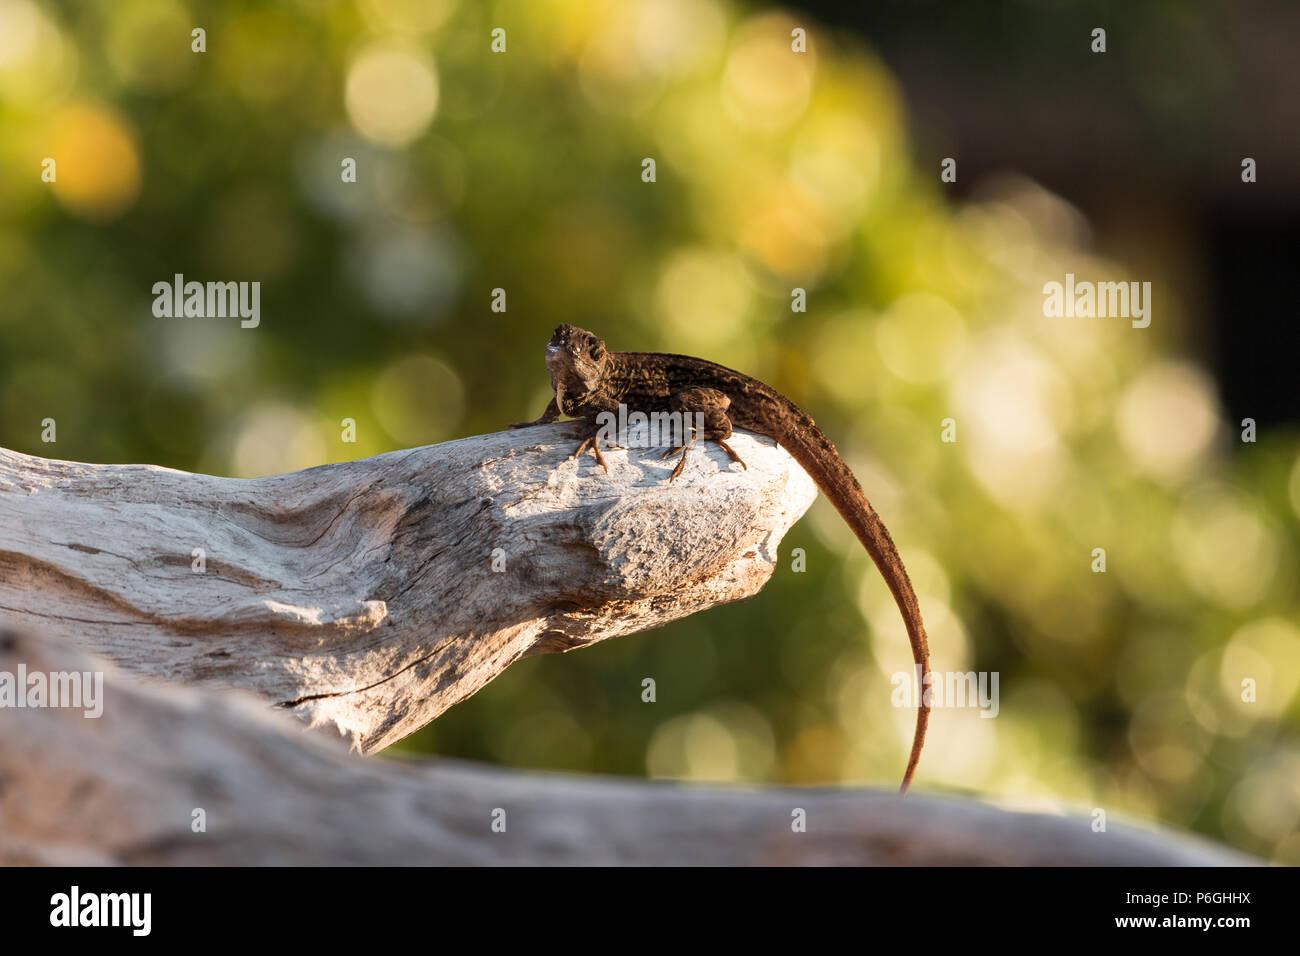 Anolis Sagrei Stock Photos & Anolis Sagrei Stock Images ...